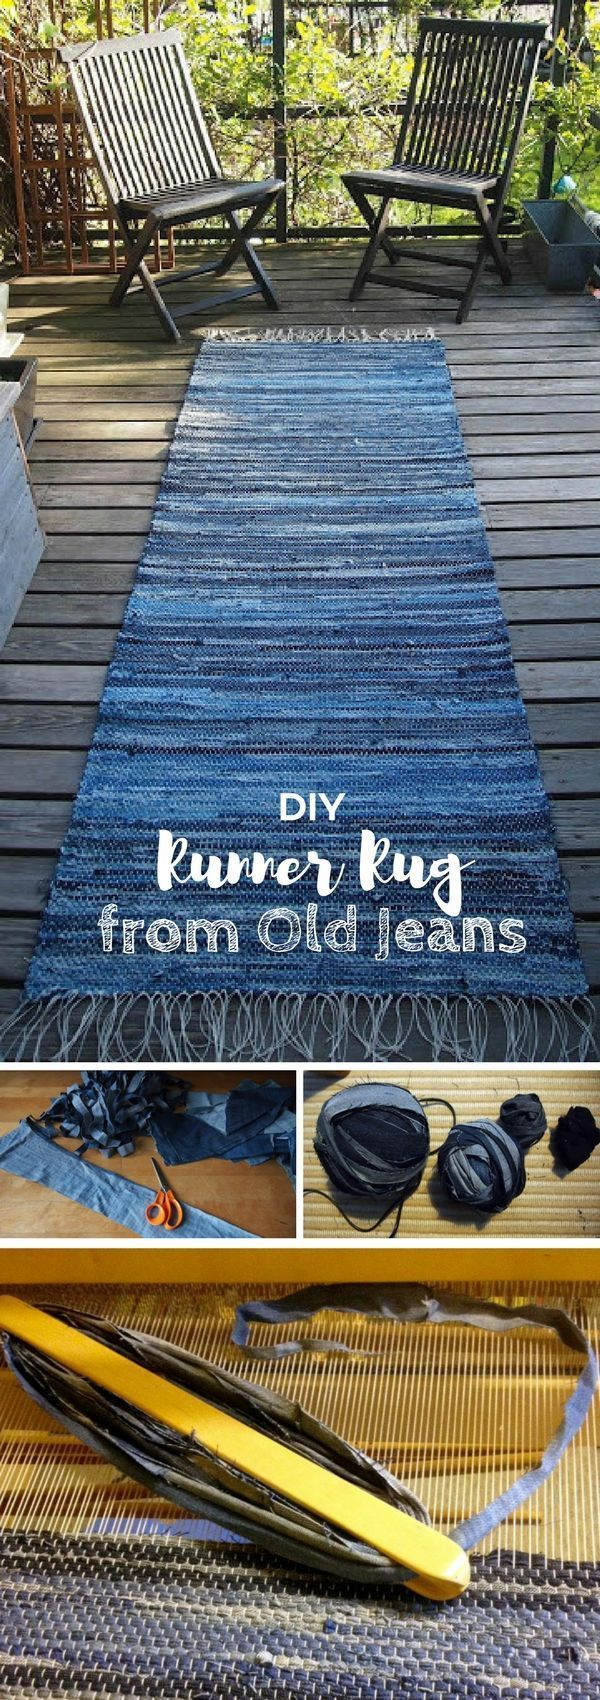 How To Make A Traditional Rag Rug Infographic Rag Rug Tutorial Runner Rugs In 2020 Rag Rug Tutorial Diy Rug Denim Crafts